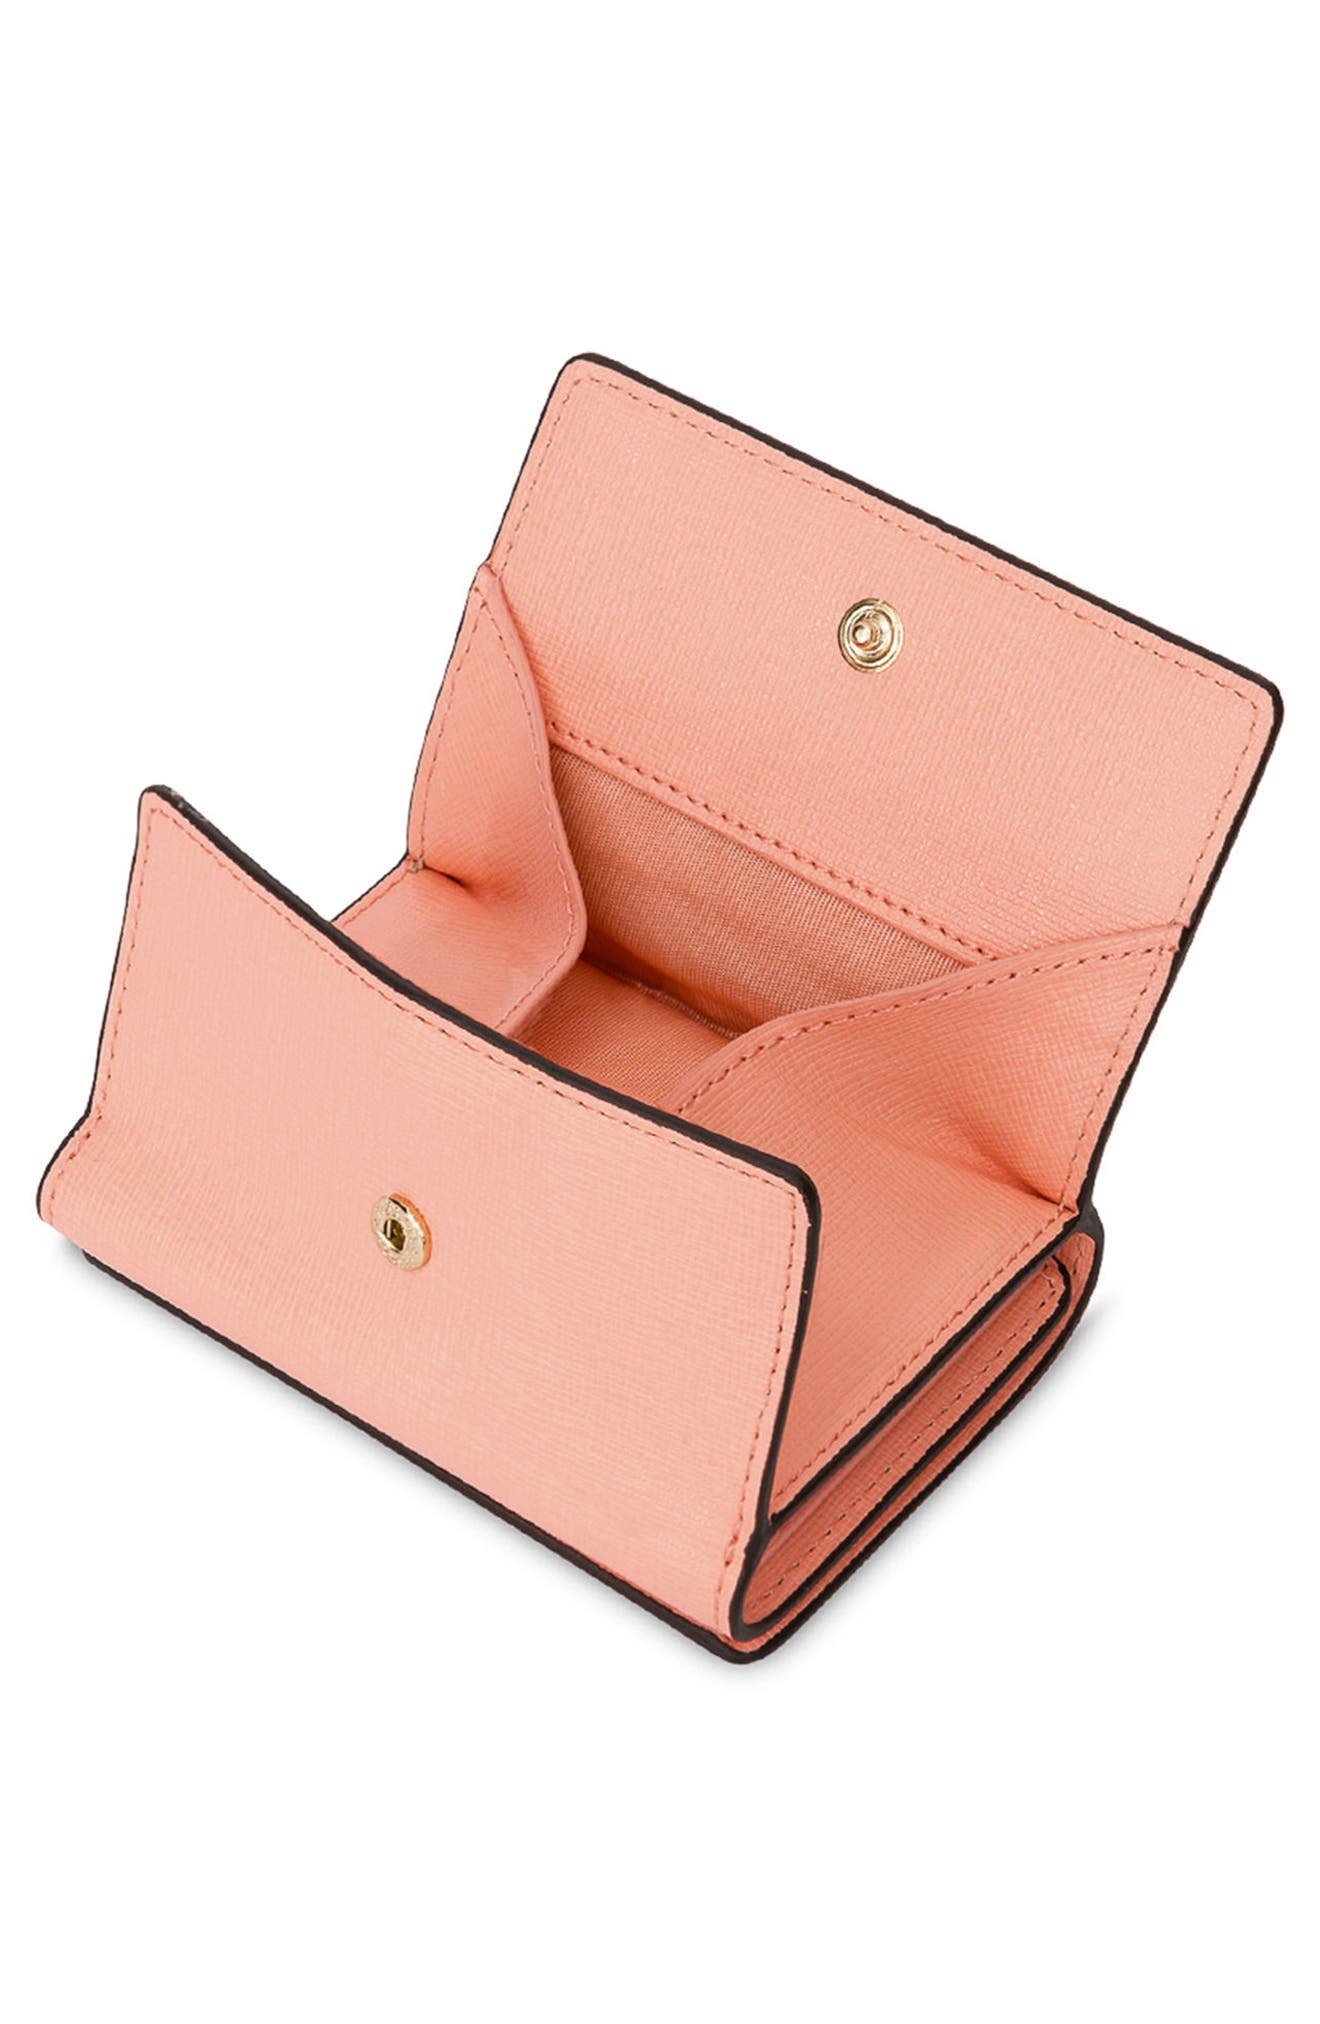 Cheap Sale Authentic Leather Zip Around Wallet - NUBIAN DREAM by VIDA VIDA Hot Sale Sale Online rwg4G